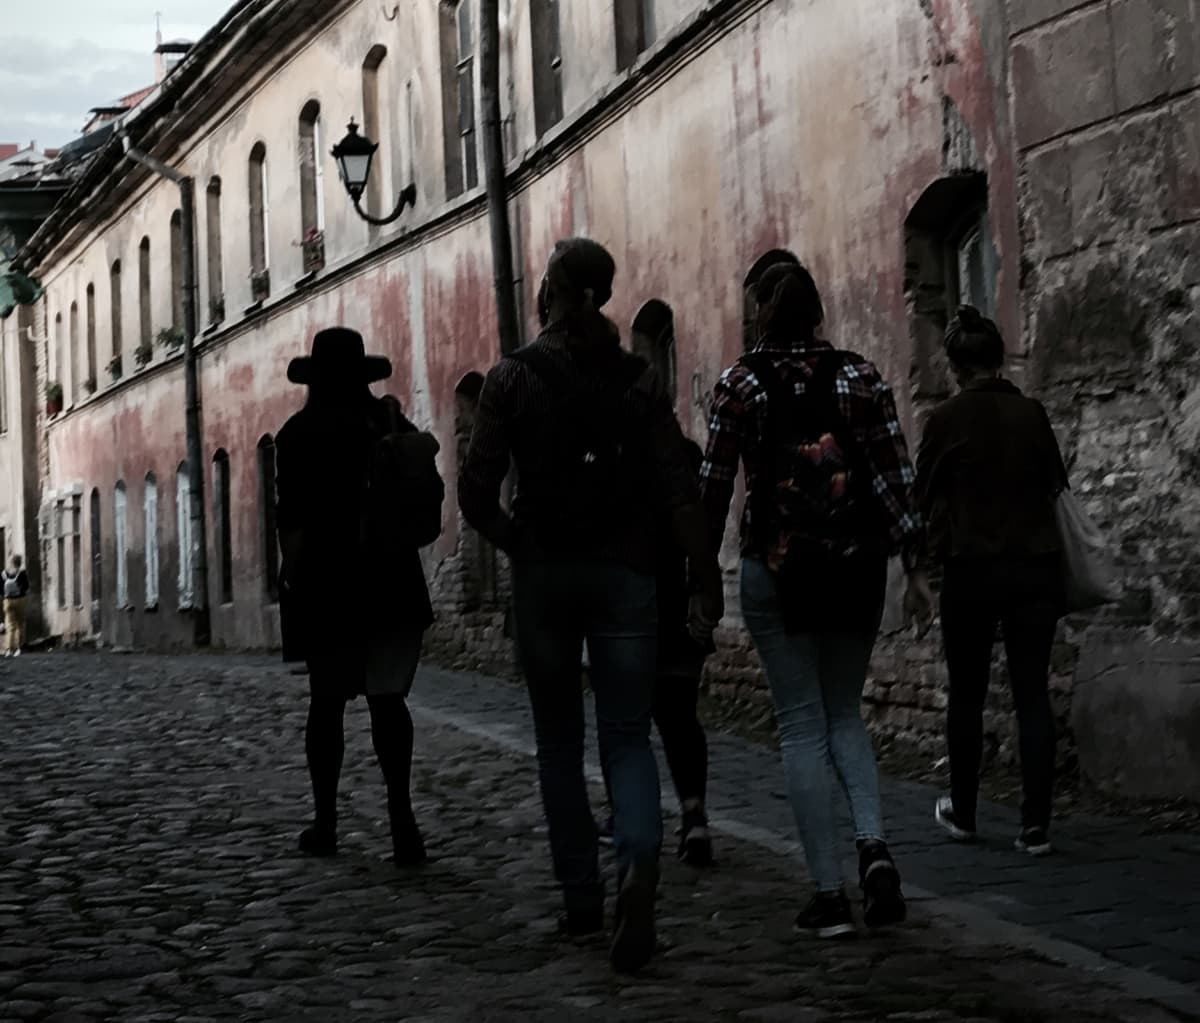 https://vilniuswithlocals.com/image/blogs/2020/07/23/vilnius-ghost-tour.jpg